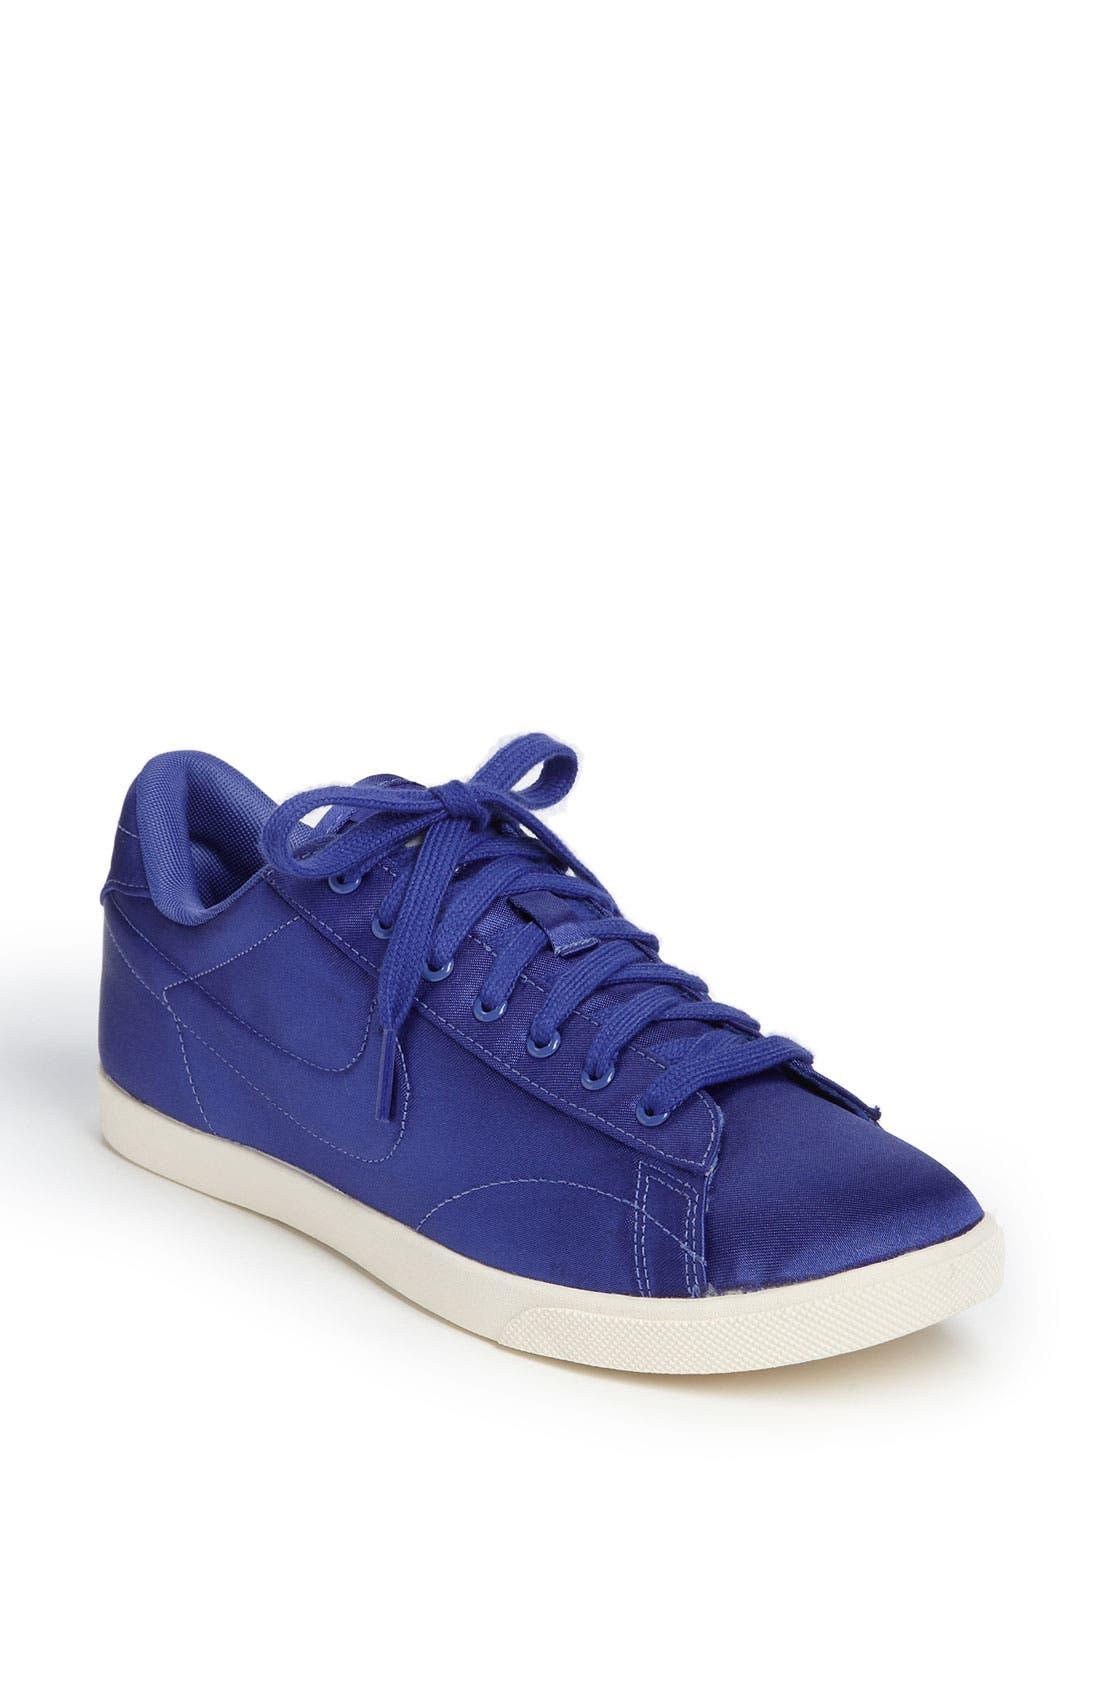 Main Image - Nike 'Racquette' Sneaker (Women)